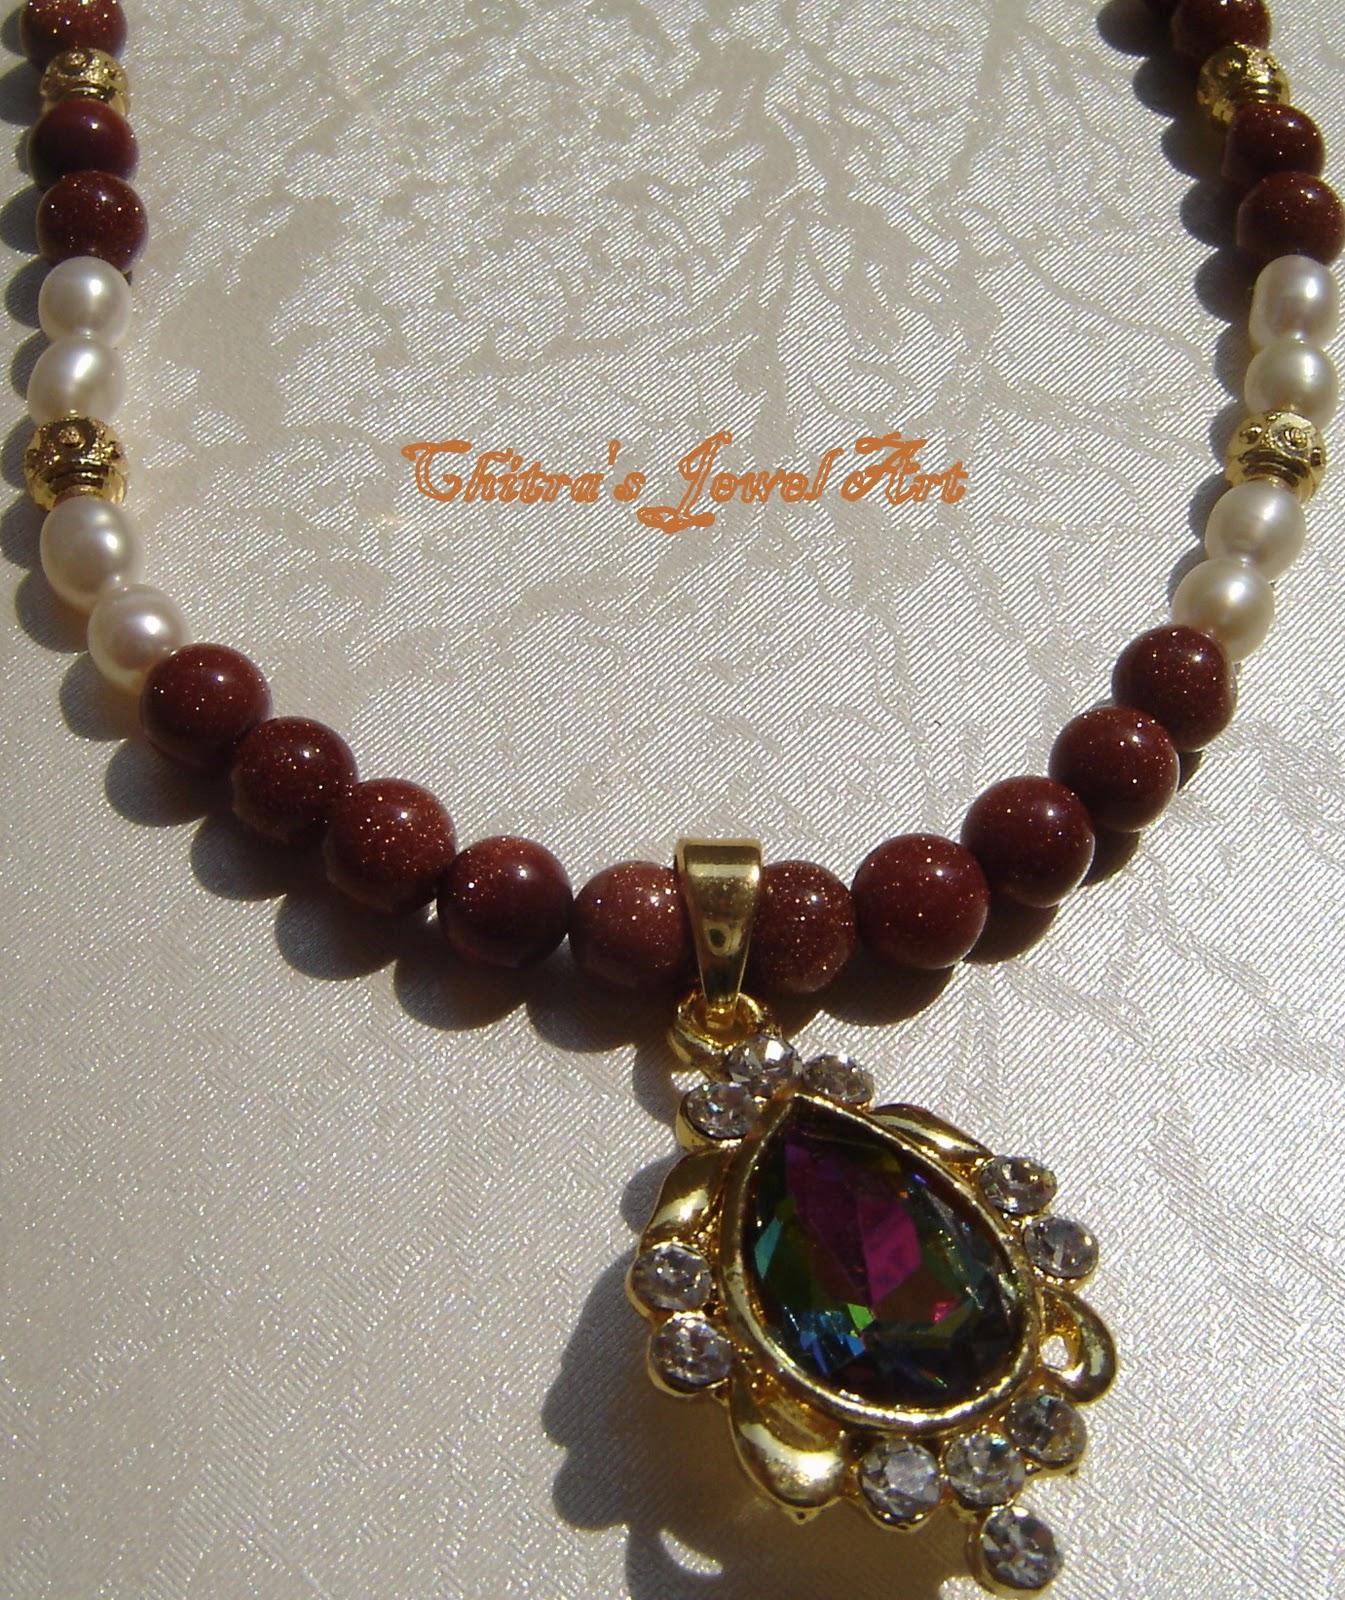 Chitra S Jewel Art